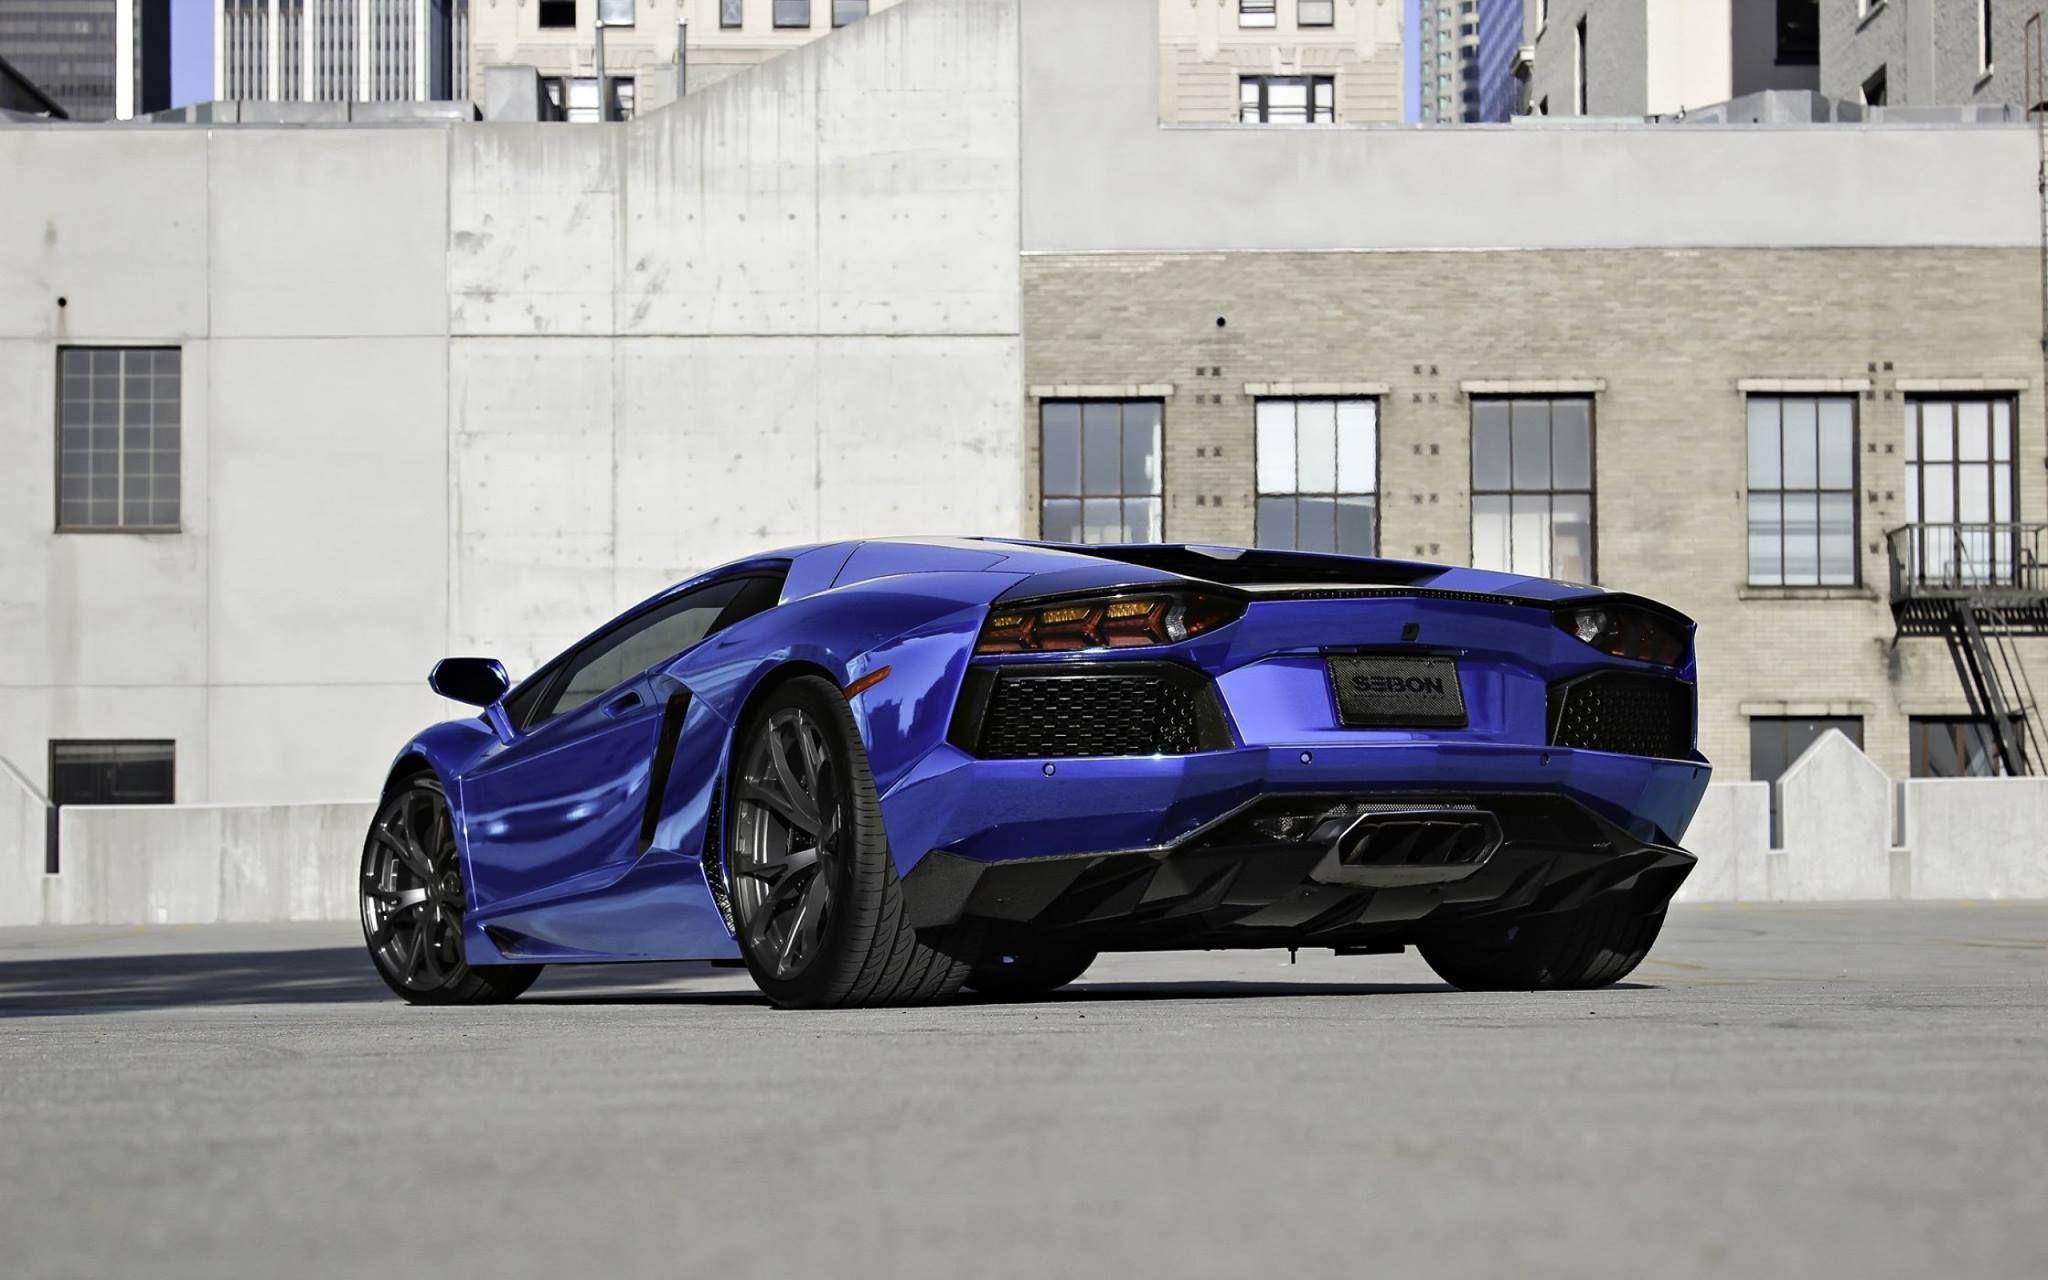 Chrome Indigo And Black Lamborghini Spectacular Sports Cars - Really nice sports cars